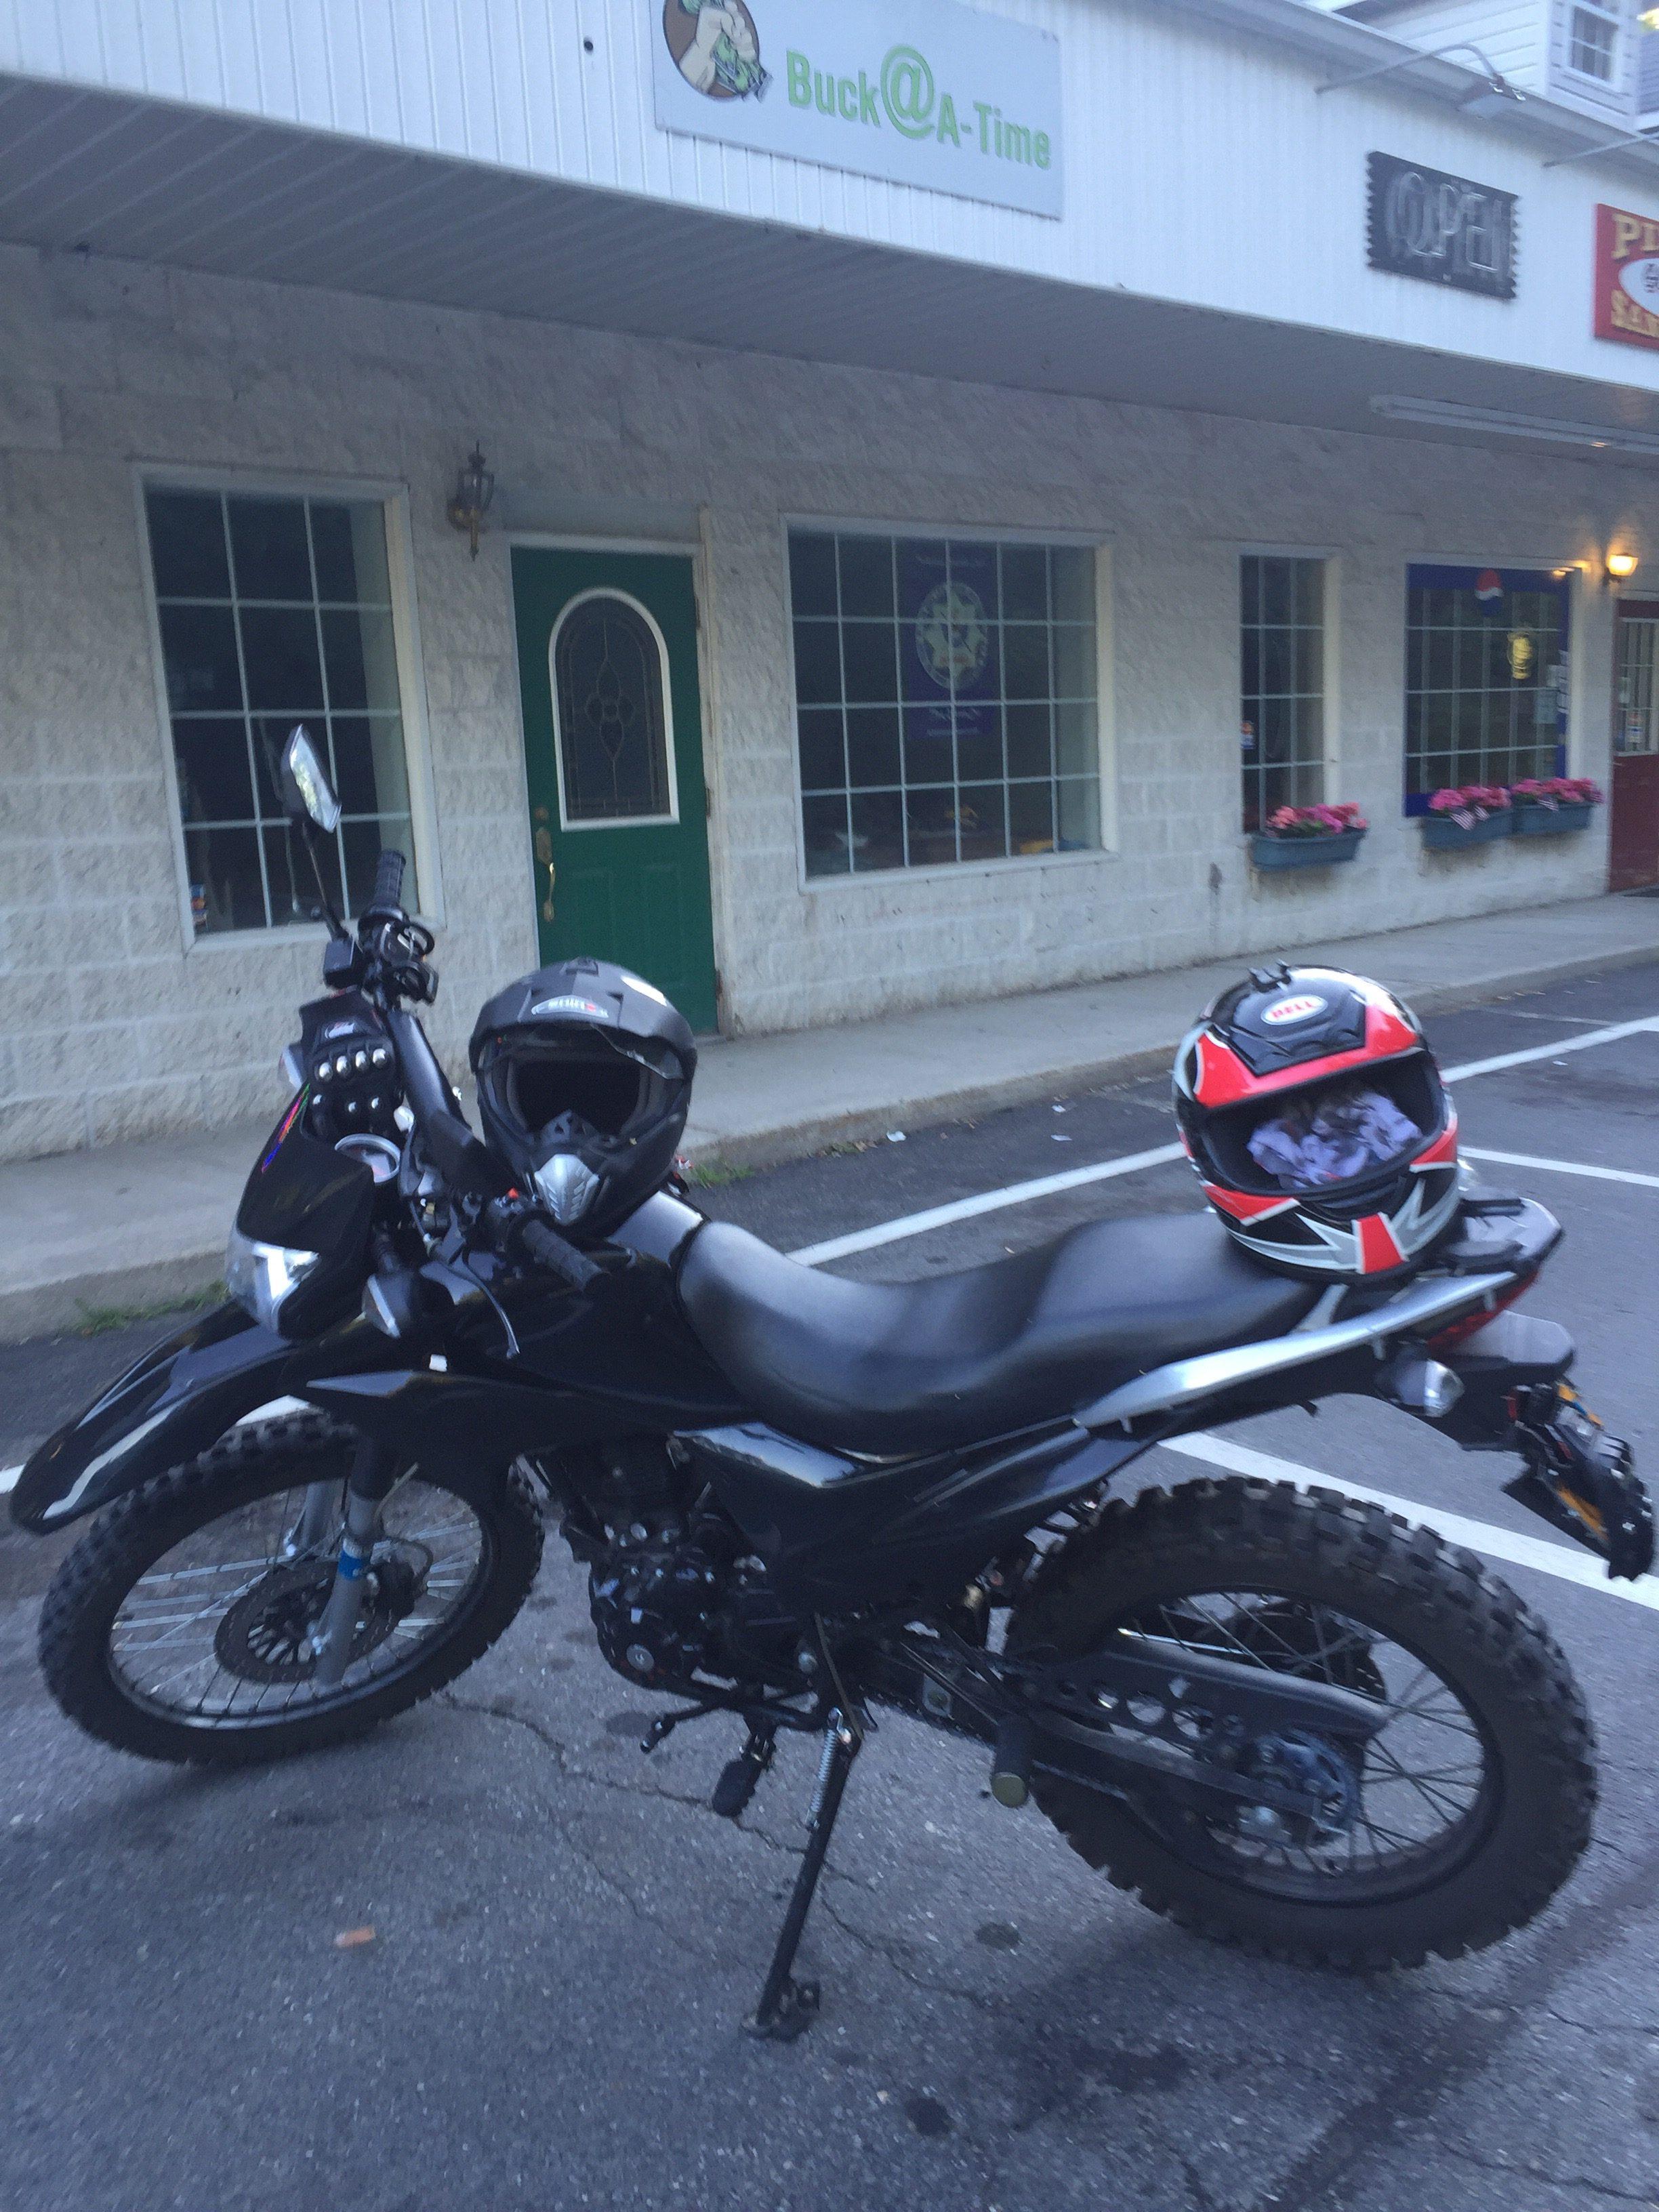 Hawk 250 RPS Dirt Bike Ride with Girlfriend